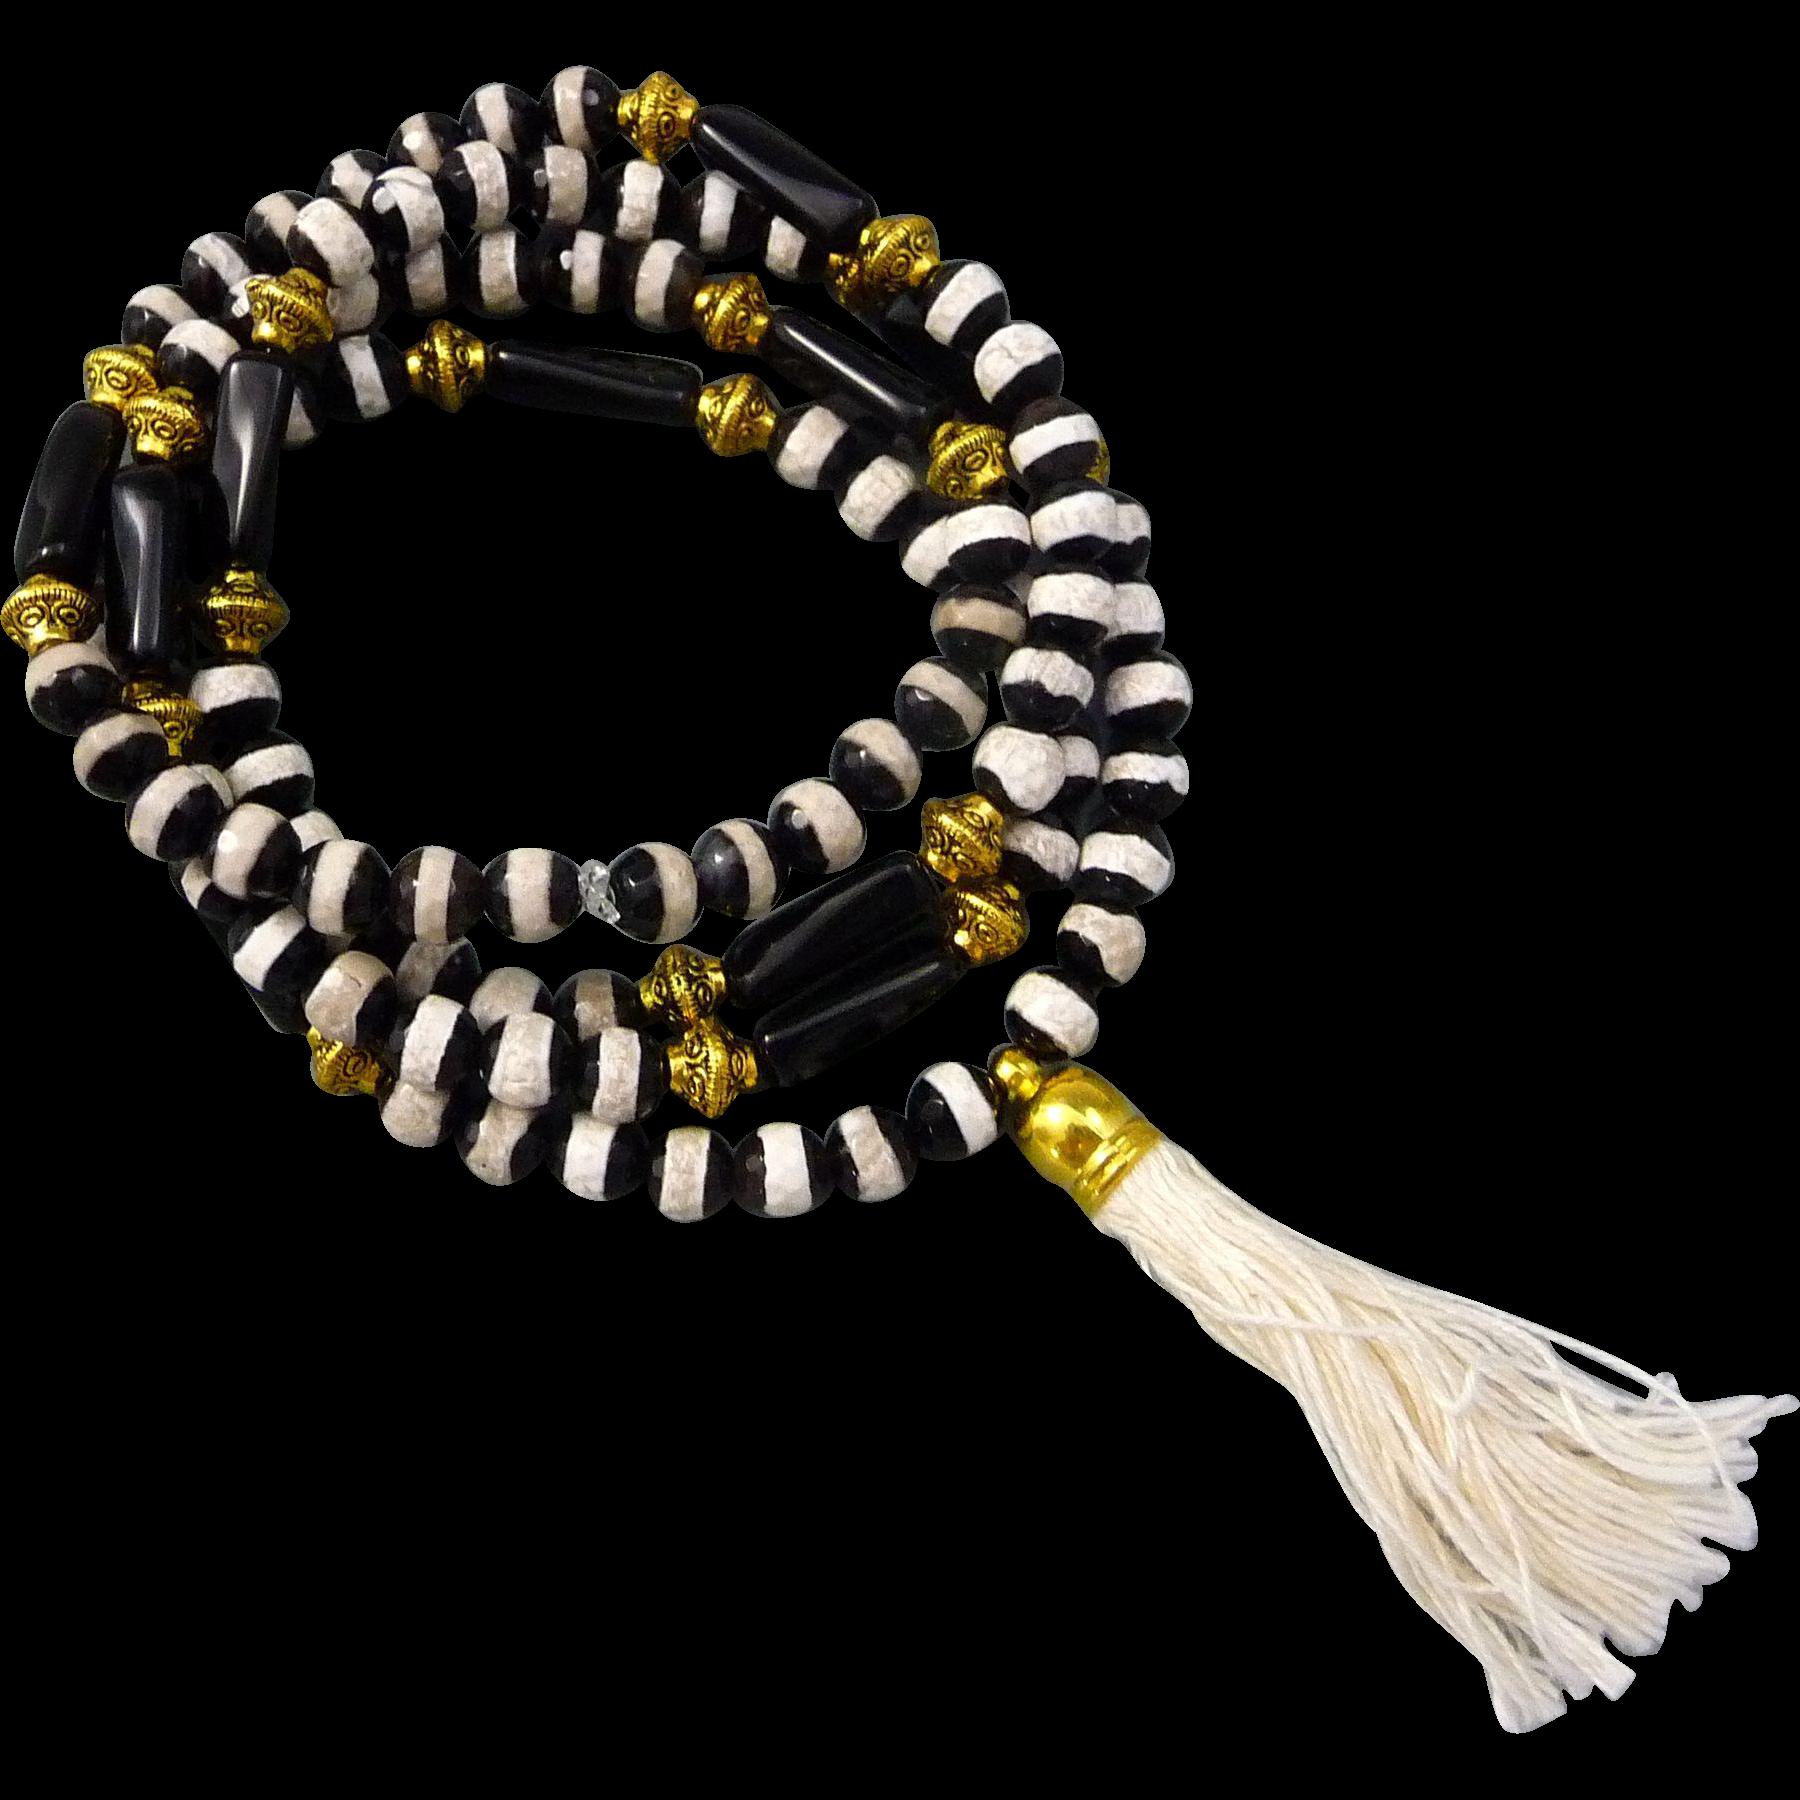 Elastic Wrap Bracelet or Necklace